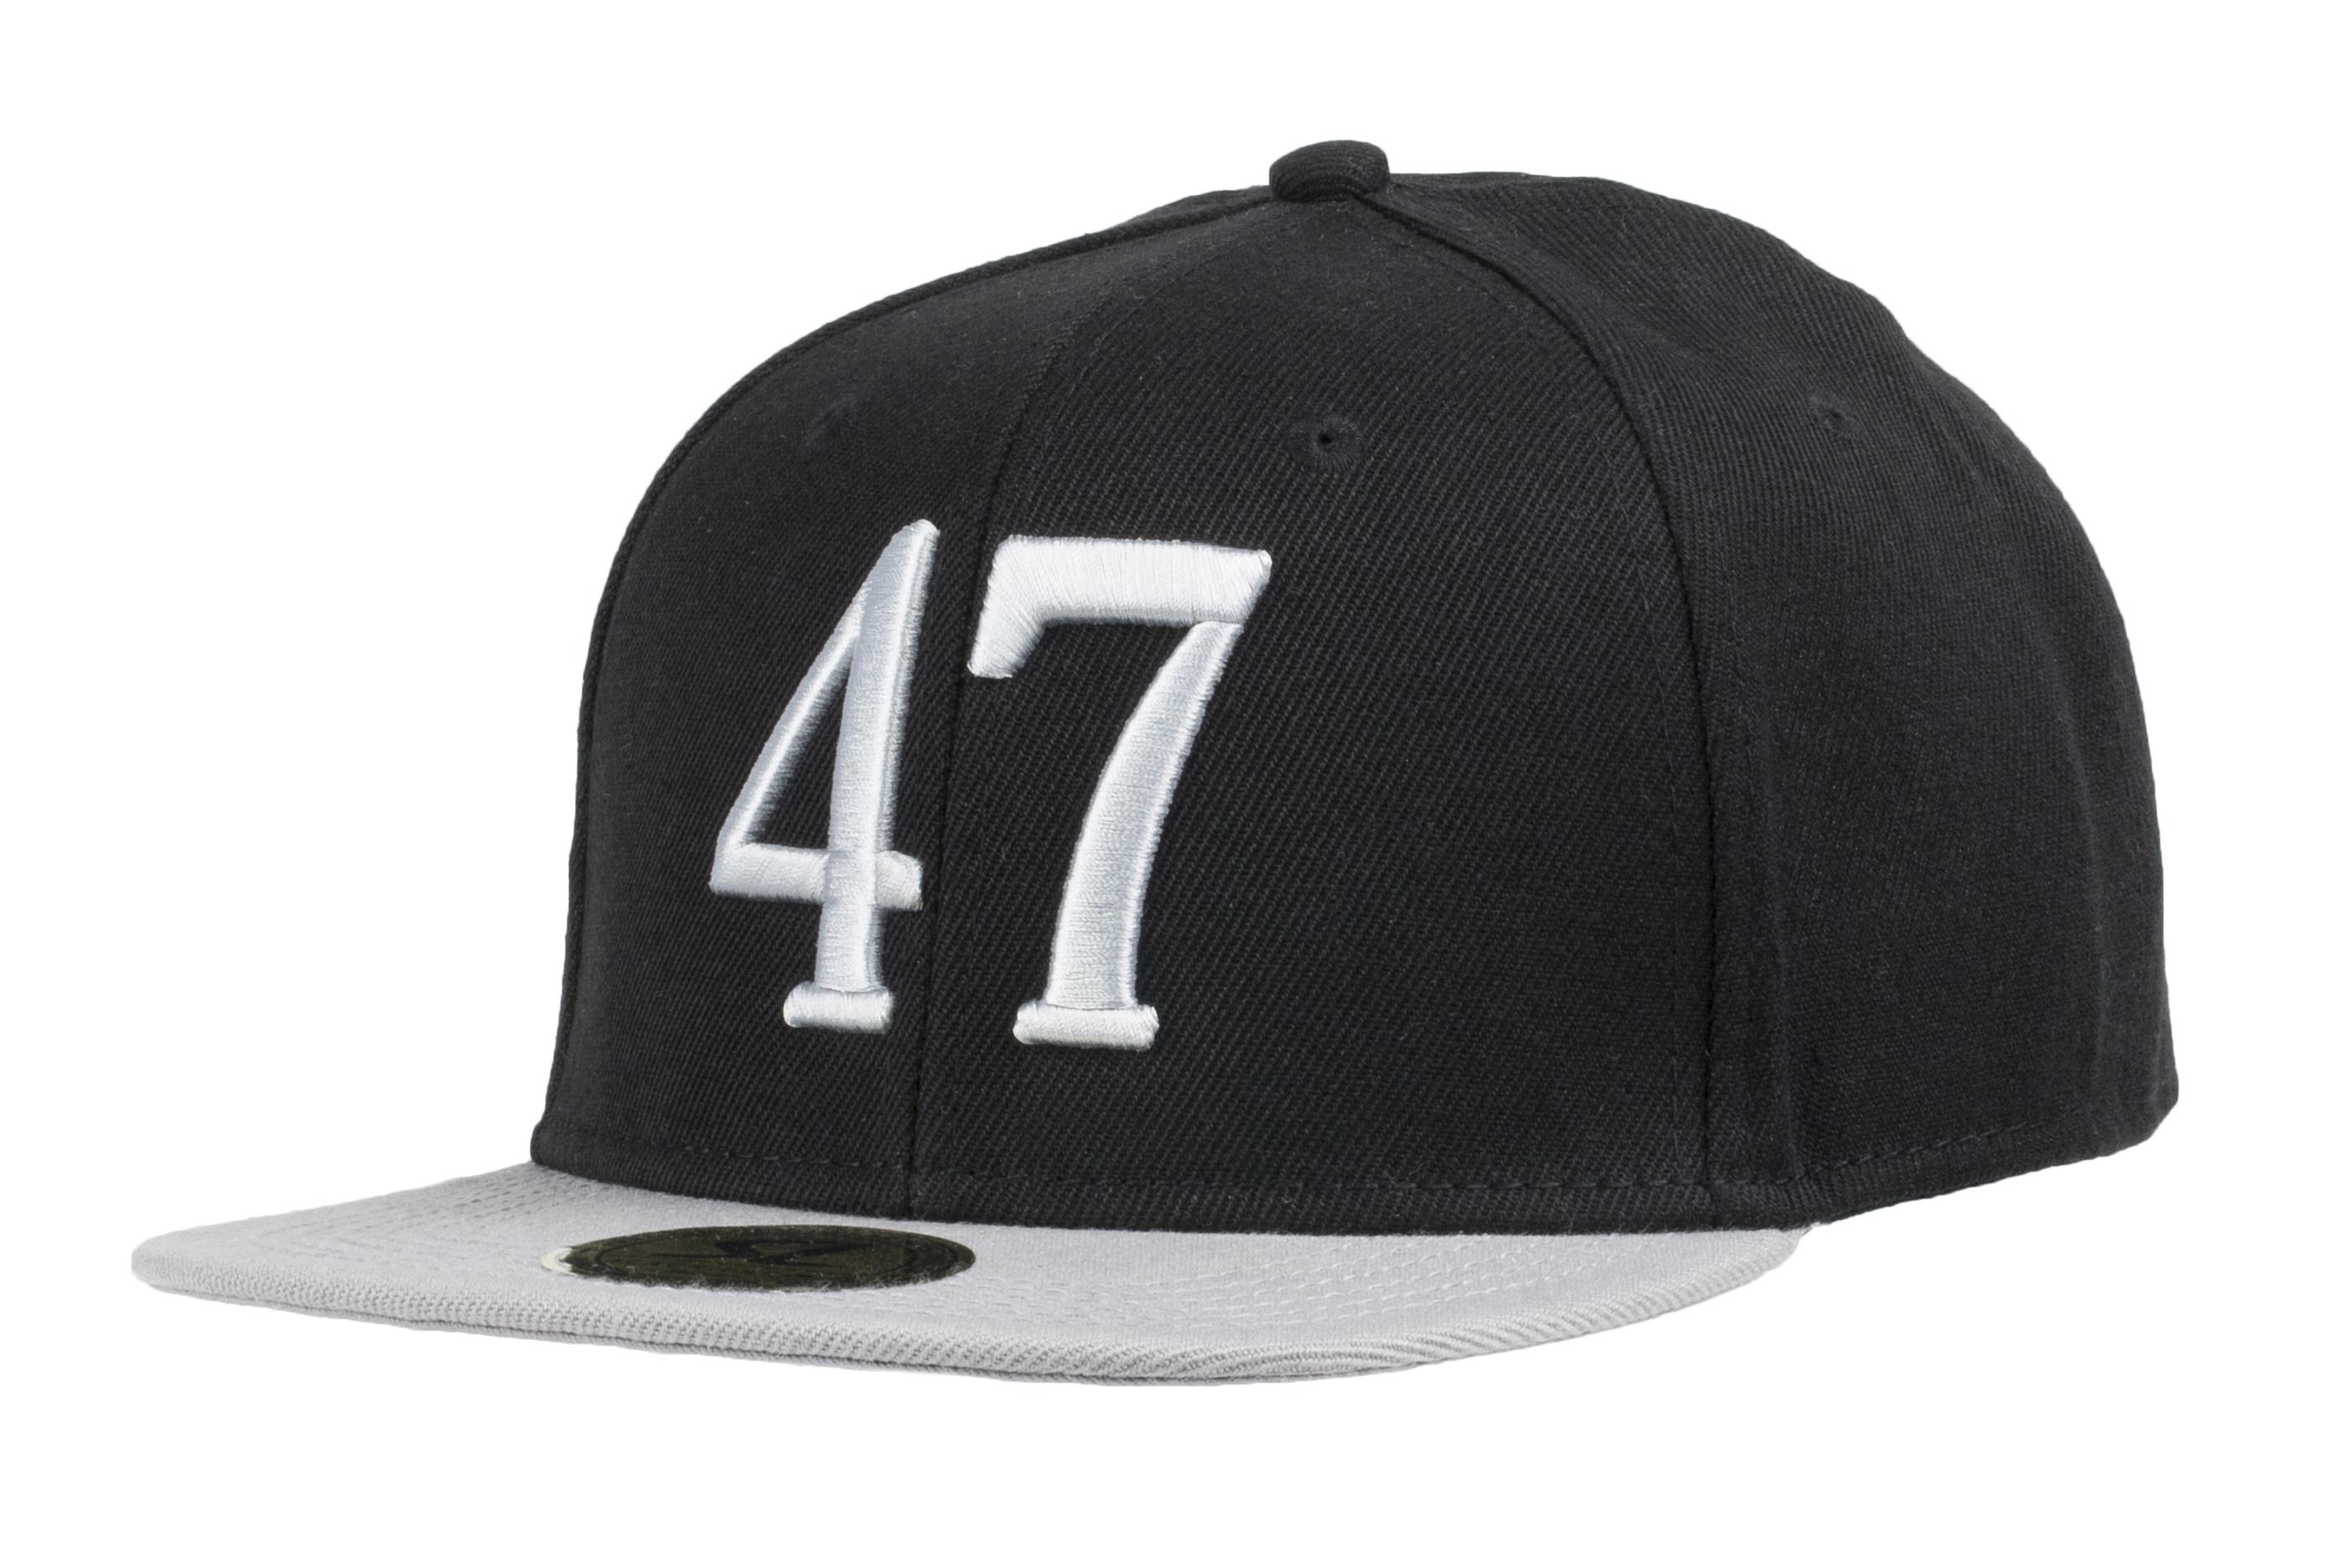 Classic 47 Snap Black/Grey